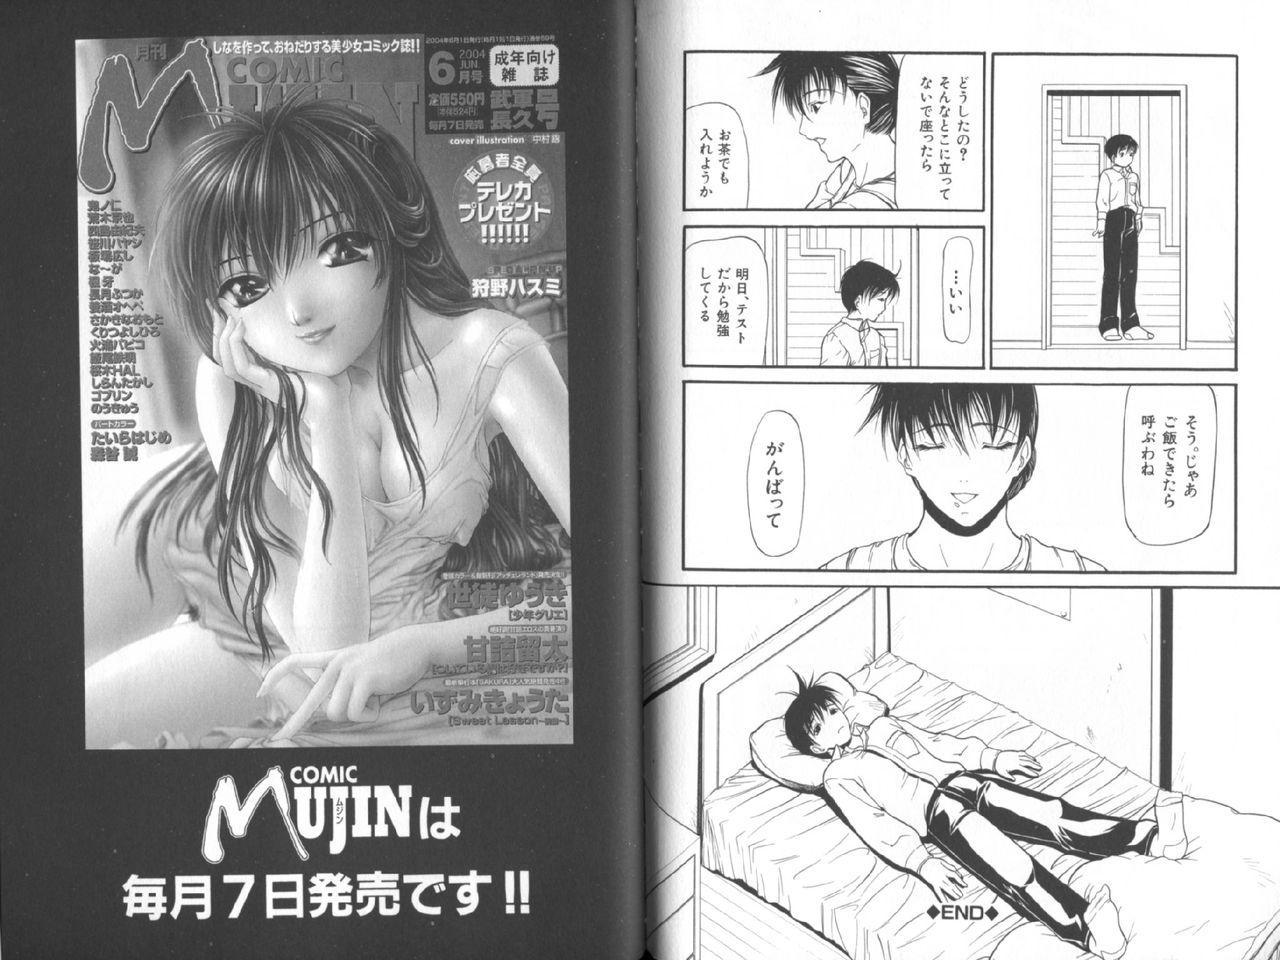 Senjou - A Desire is Instigated 95